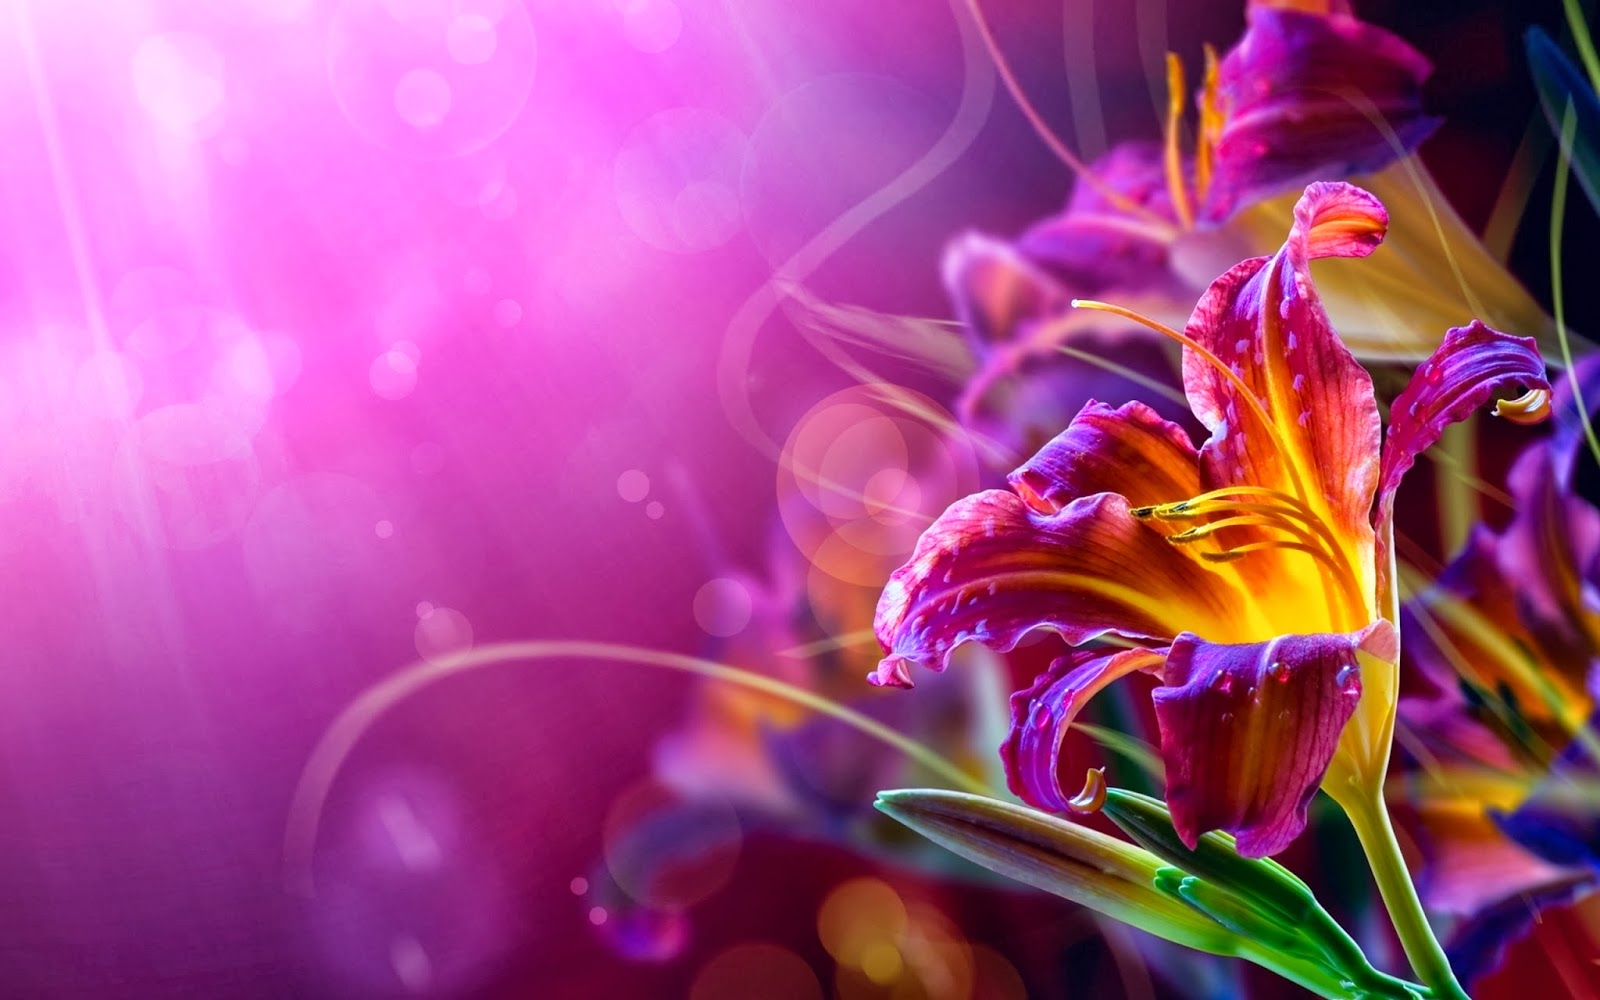 30 Wallpaper Bunga Cantik Deloiz Wallpaper